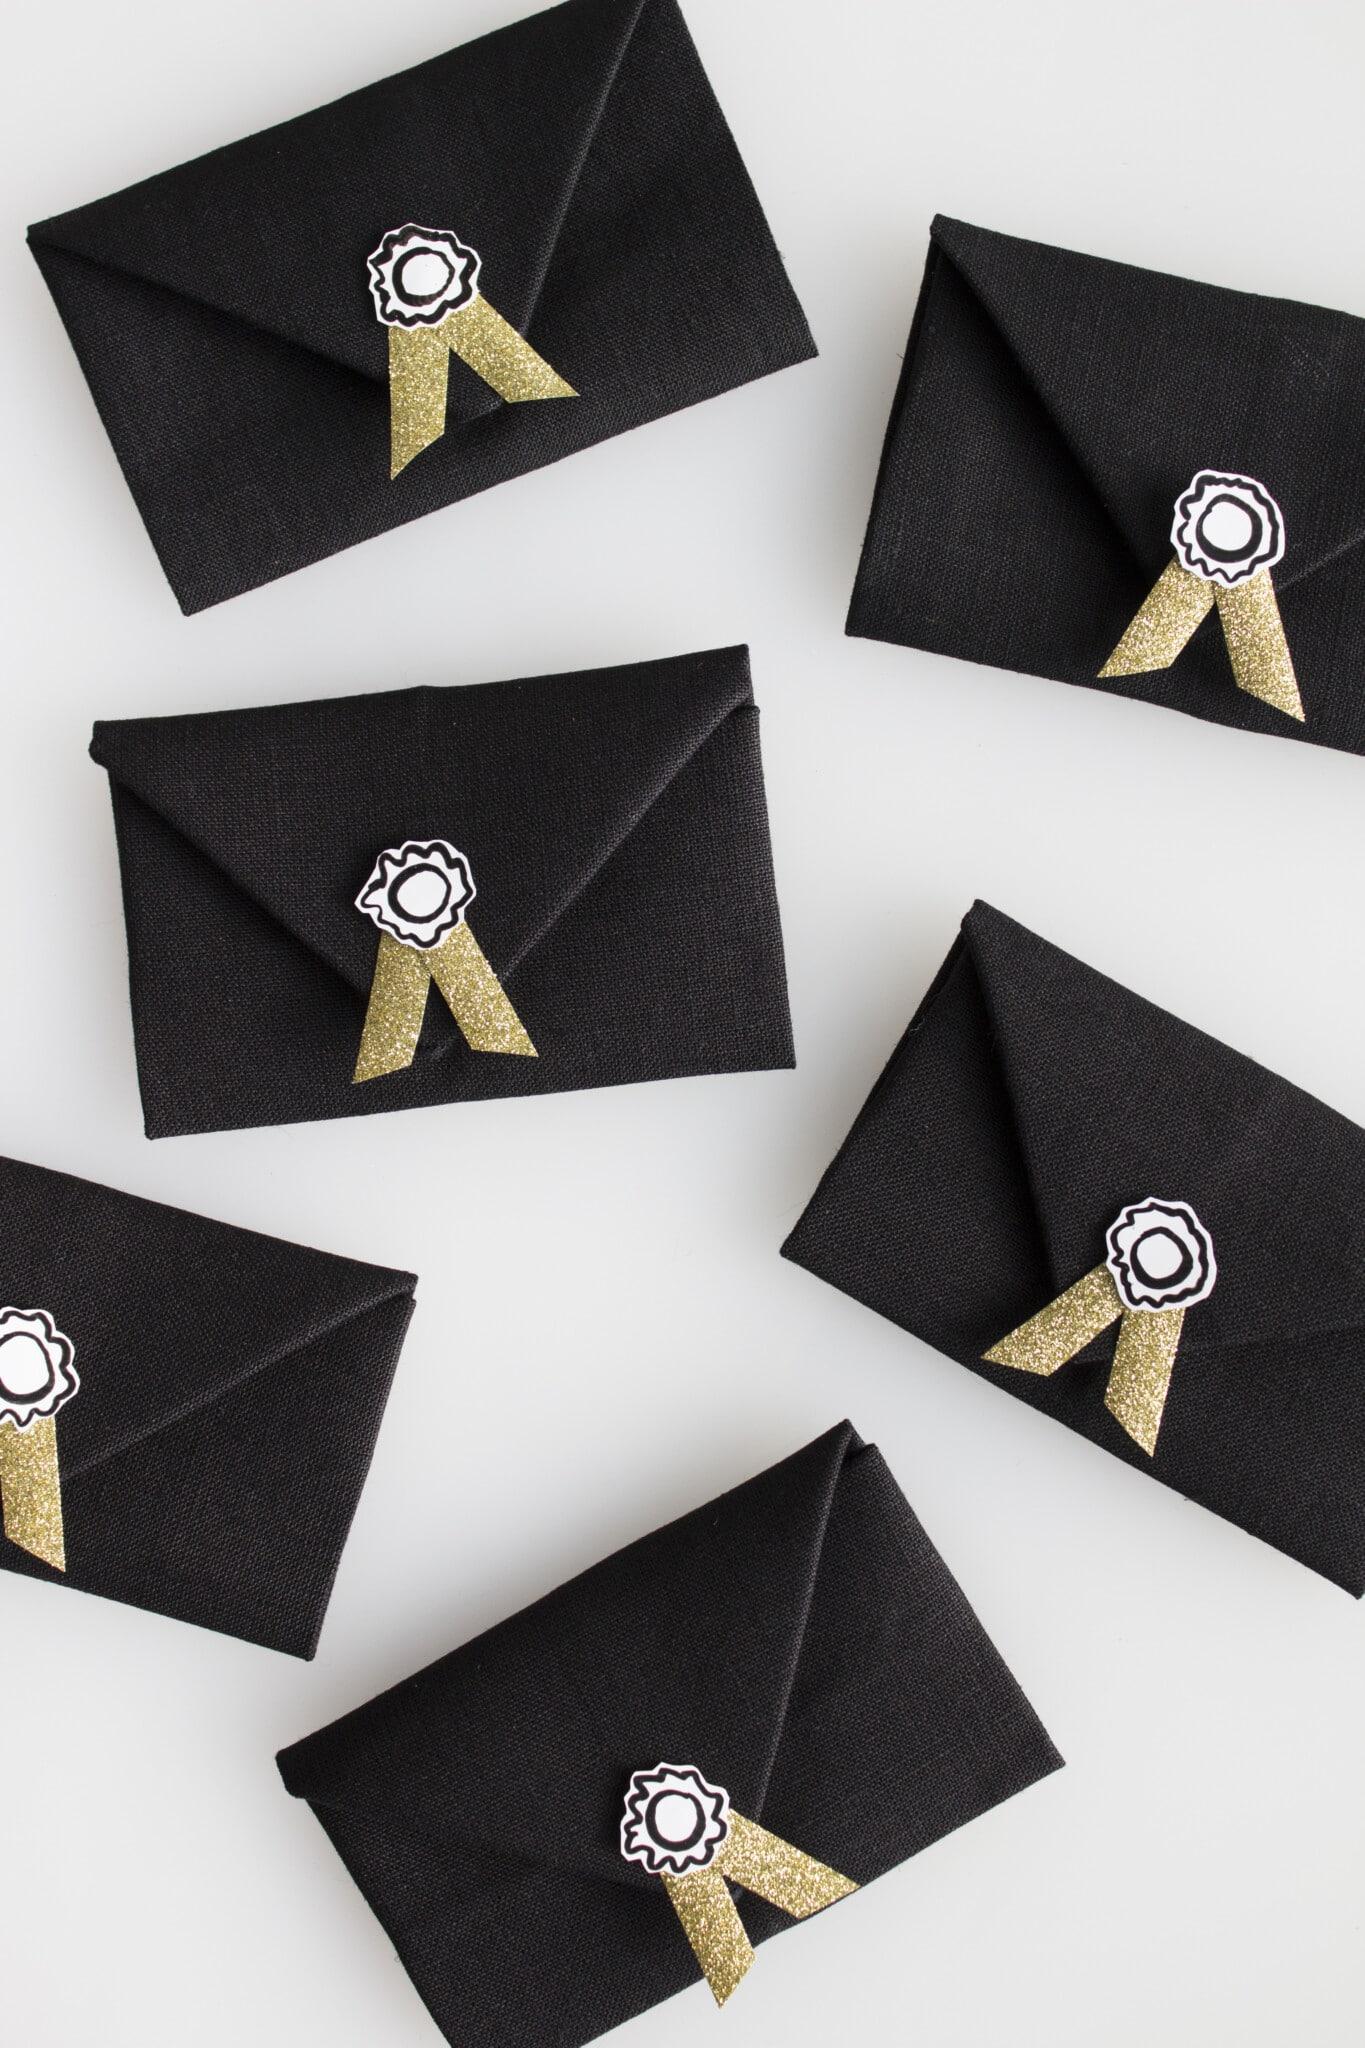 Envelope napkins make great Oscar party ideas